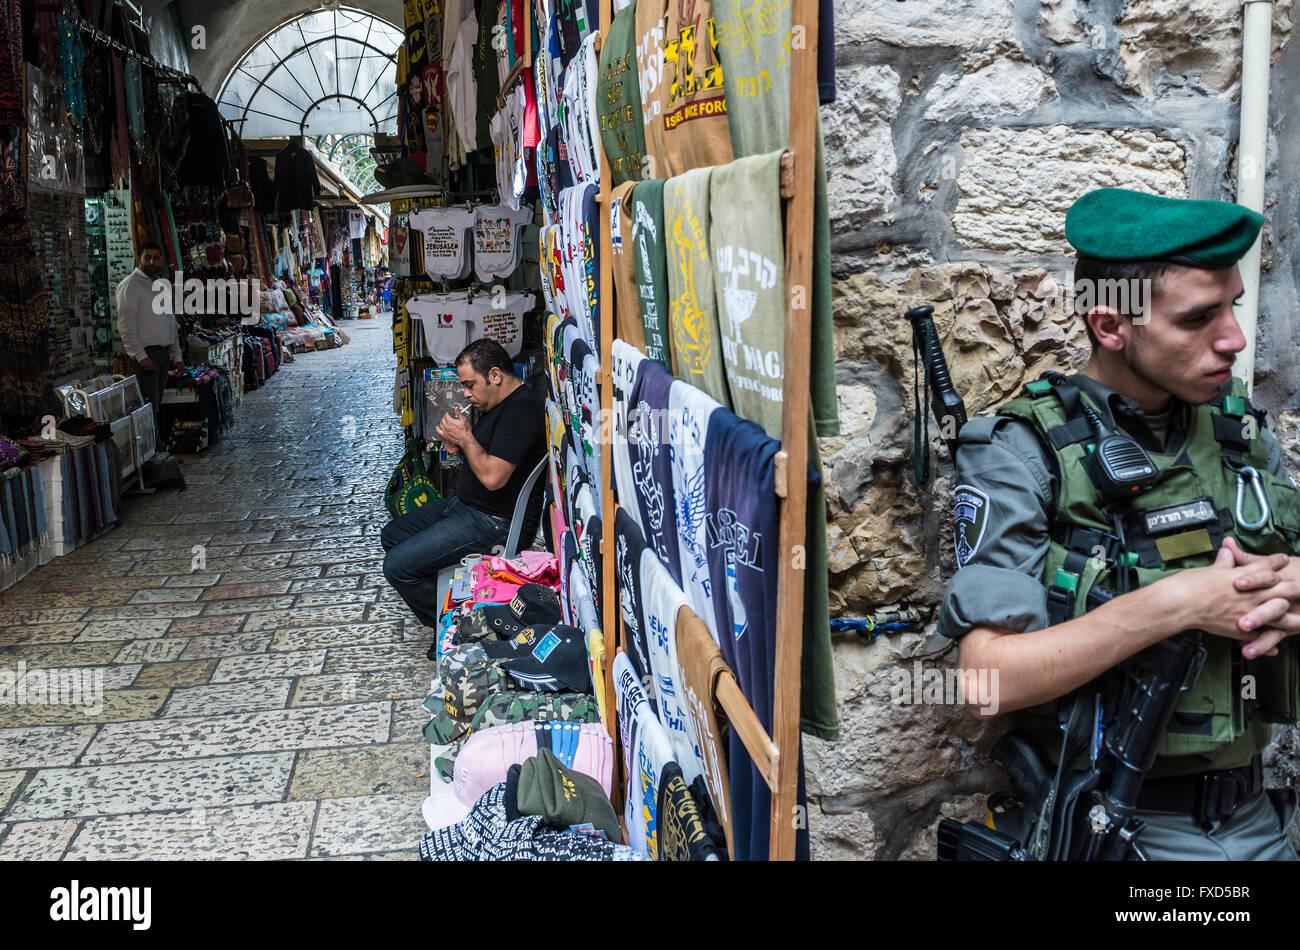 Israeli Border Police Magav on Arab market that sprawls across Christian and Moslem Quarters on Old City of Jerusalem, - Stock Image